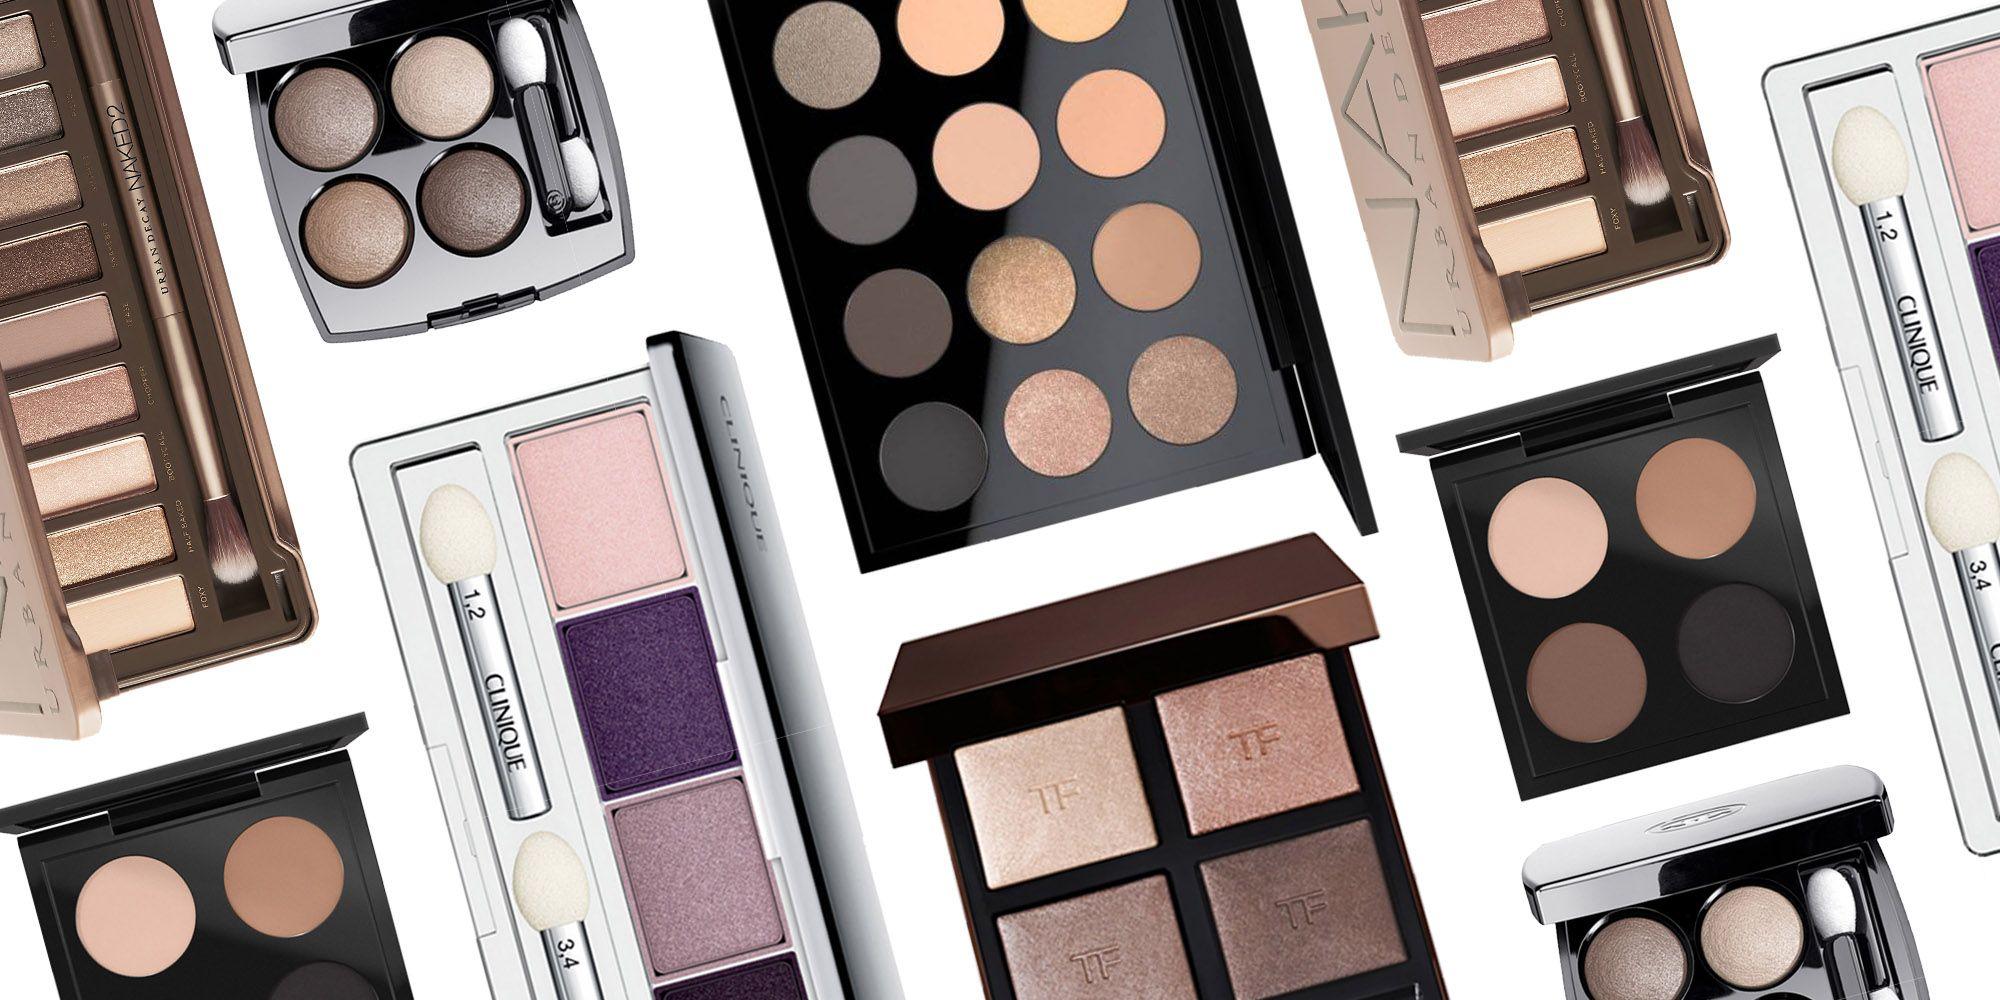 The 12 Eye Shadow Palettes ELLE Editors Love